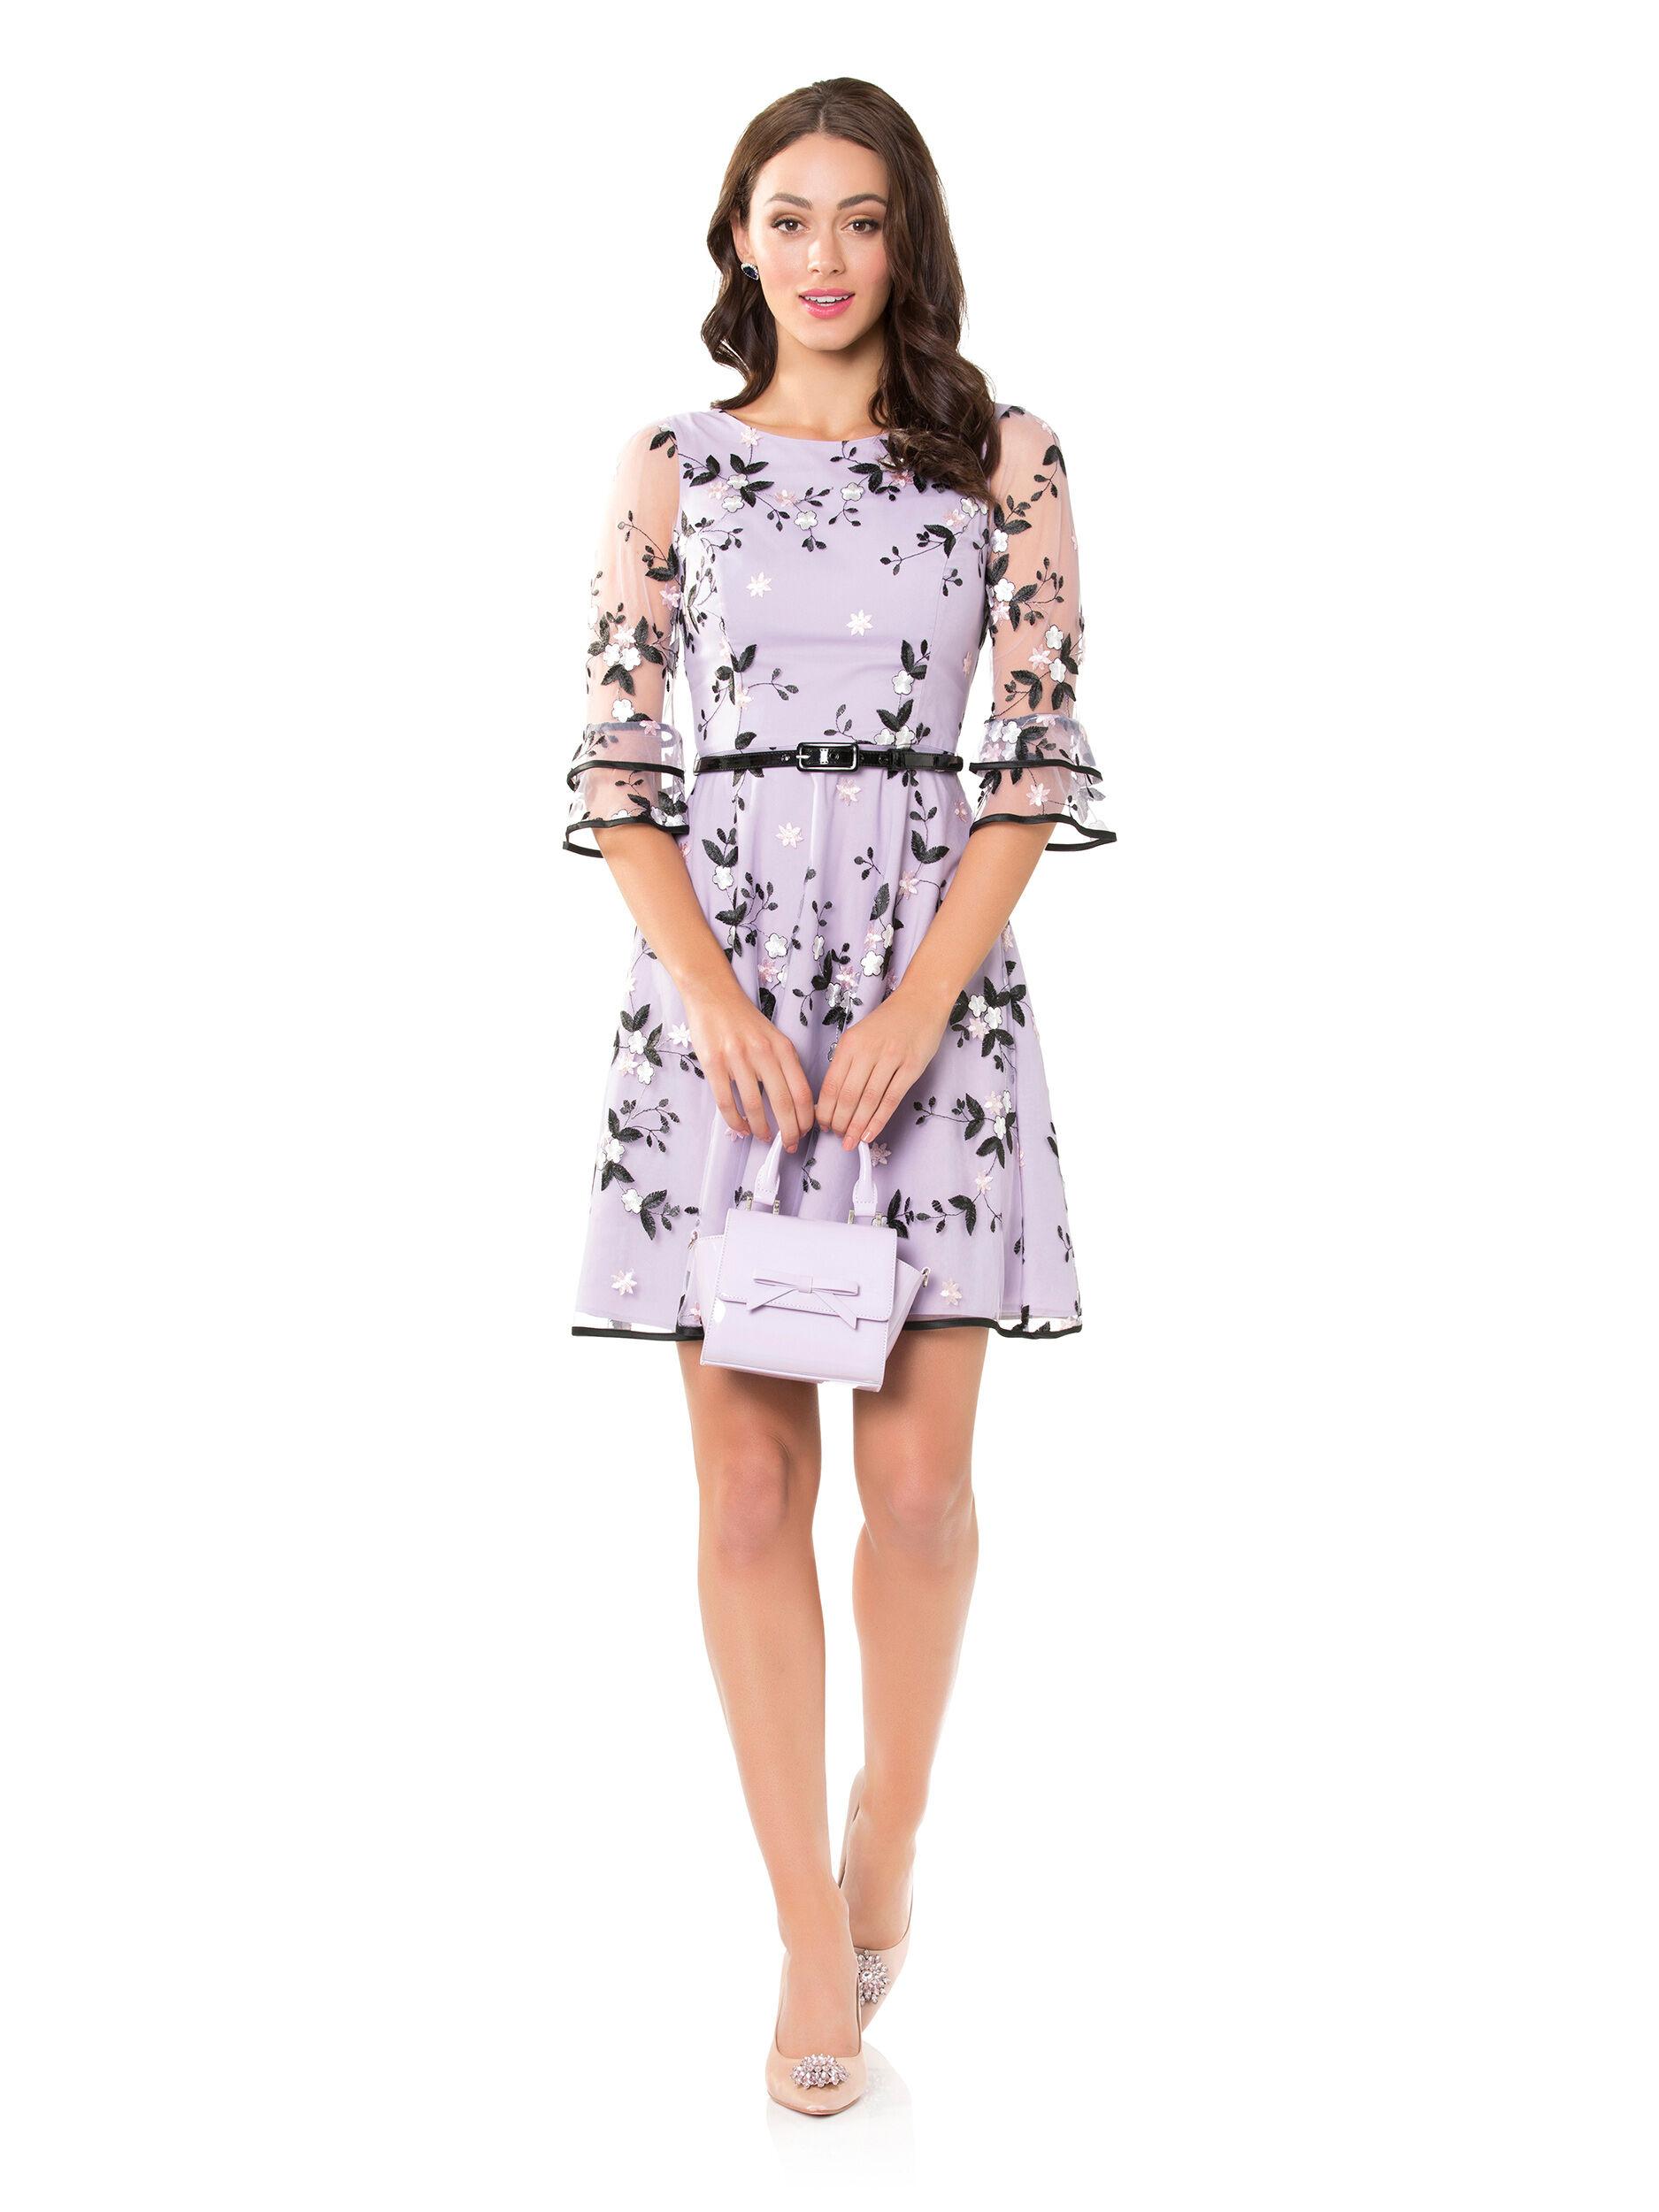 Demetra Floral Dress